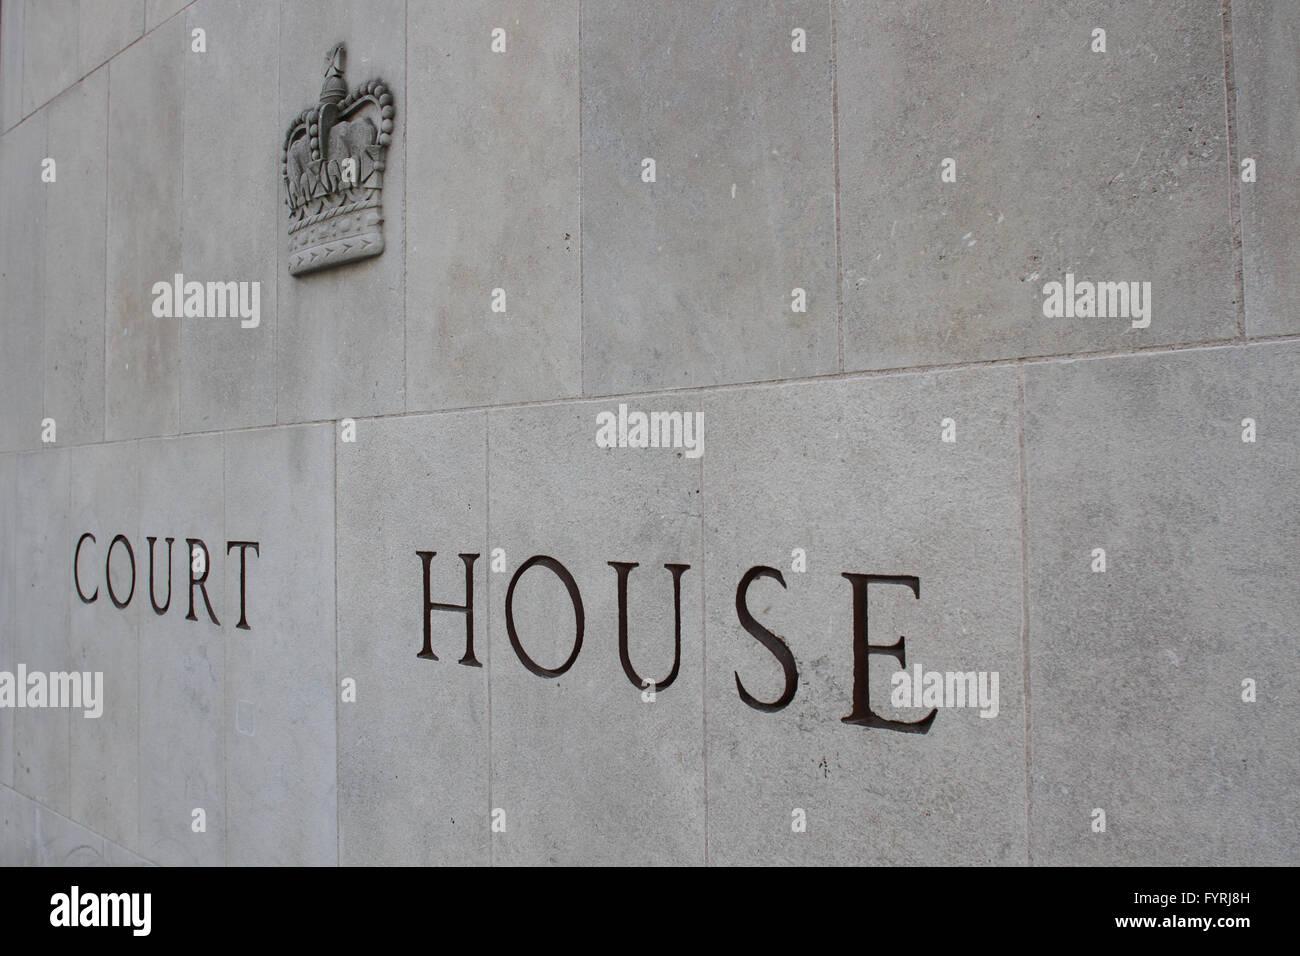 The Toronto Courthouse in Ontario. - Stock Image